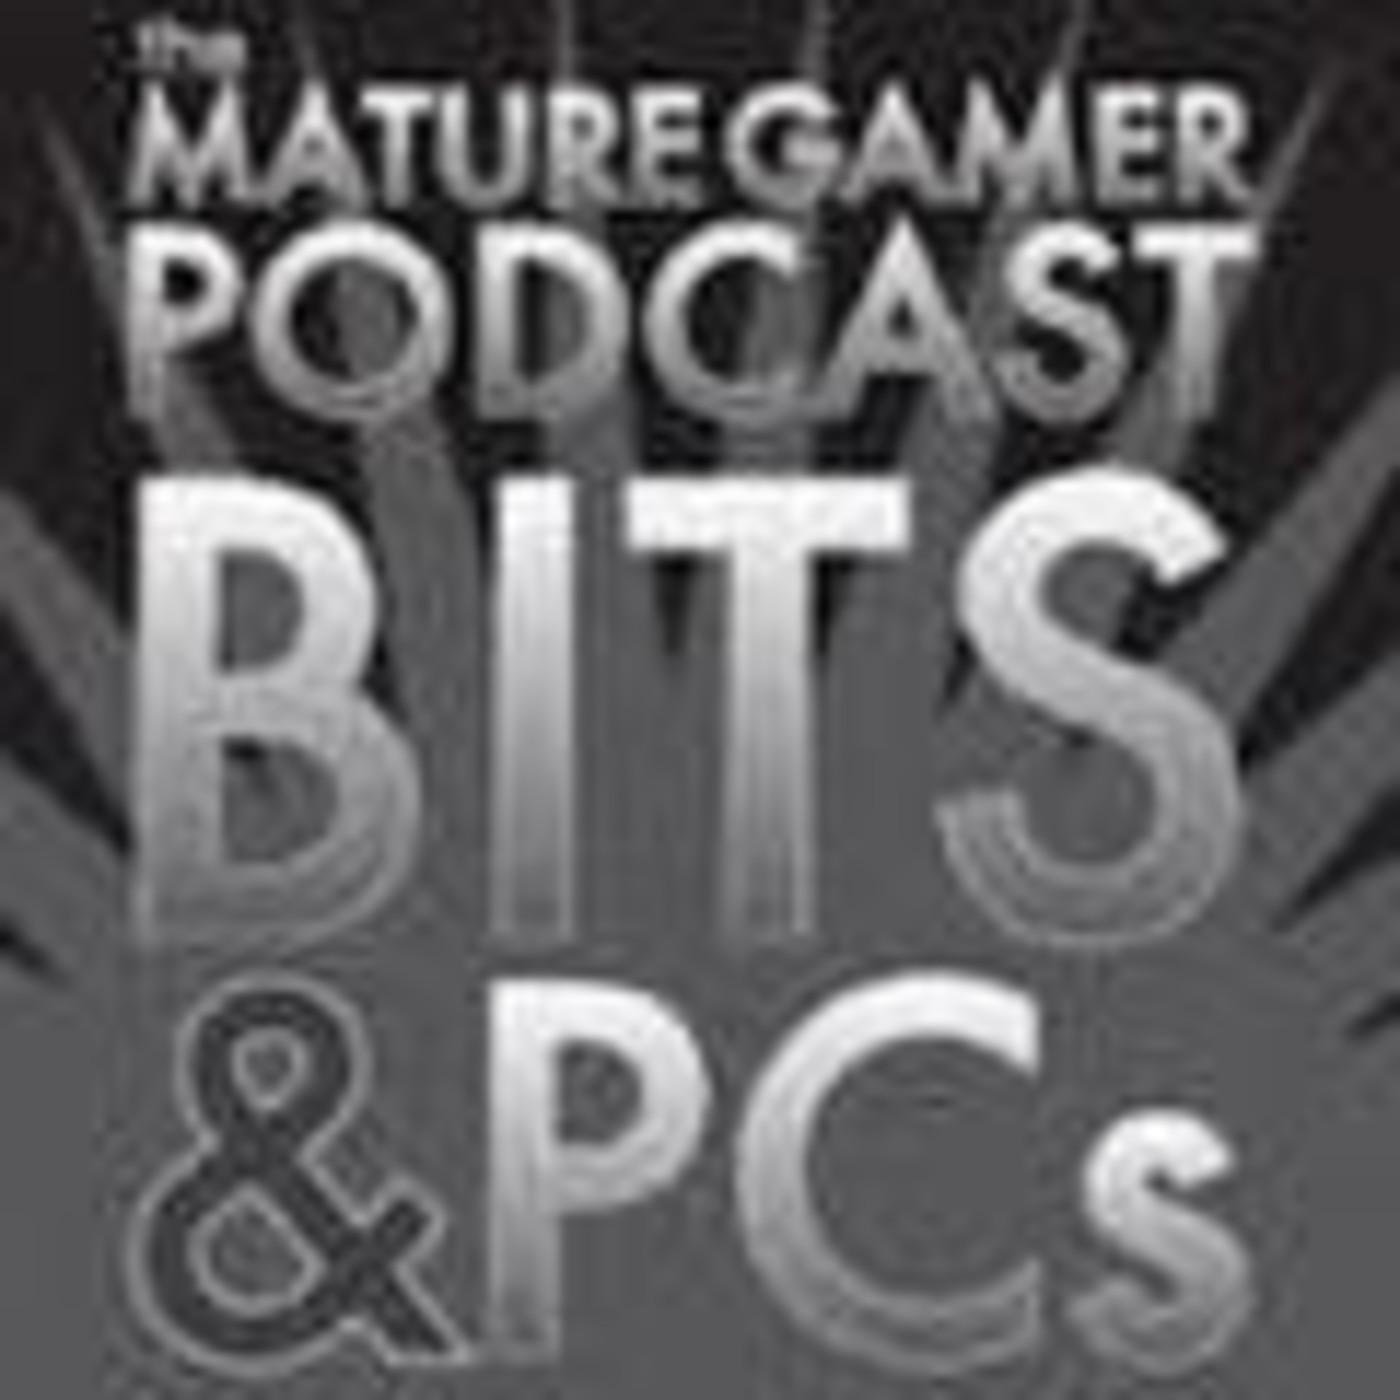 Bits & PCs Podcast